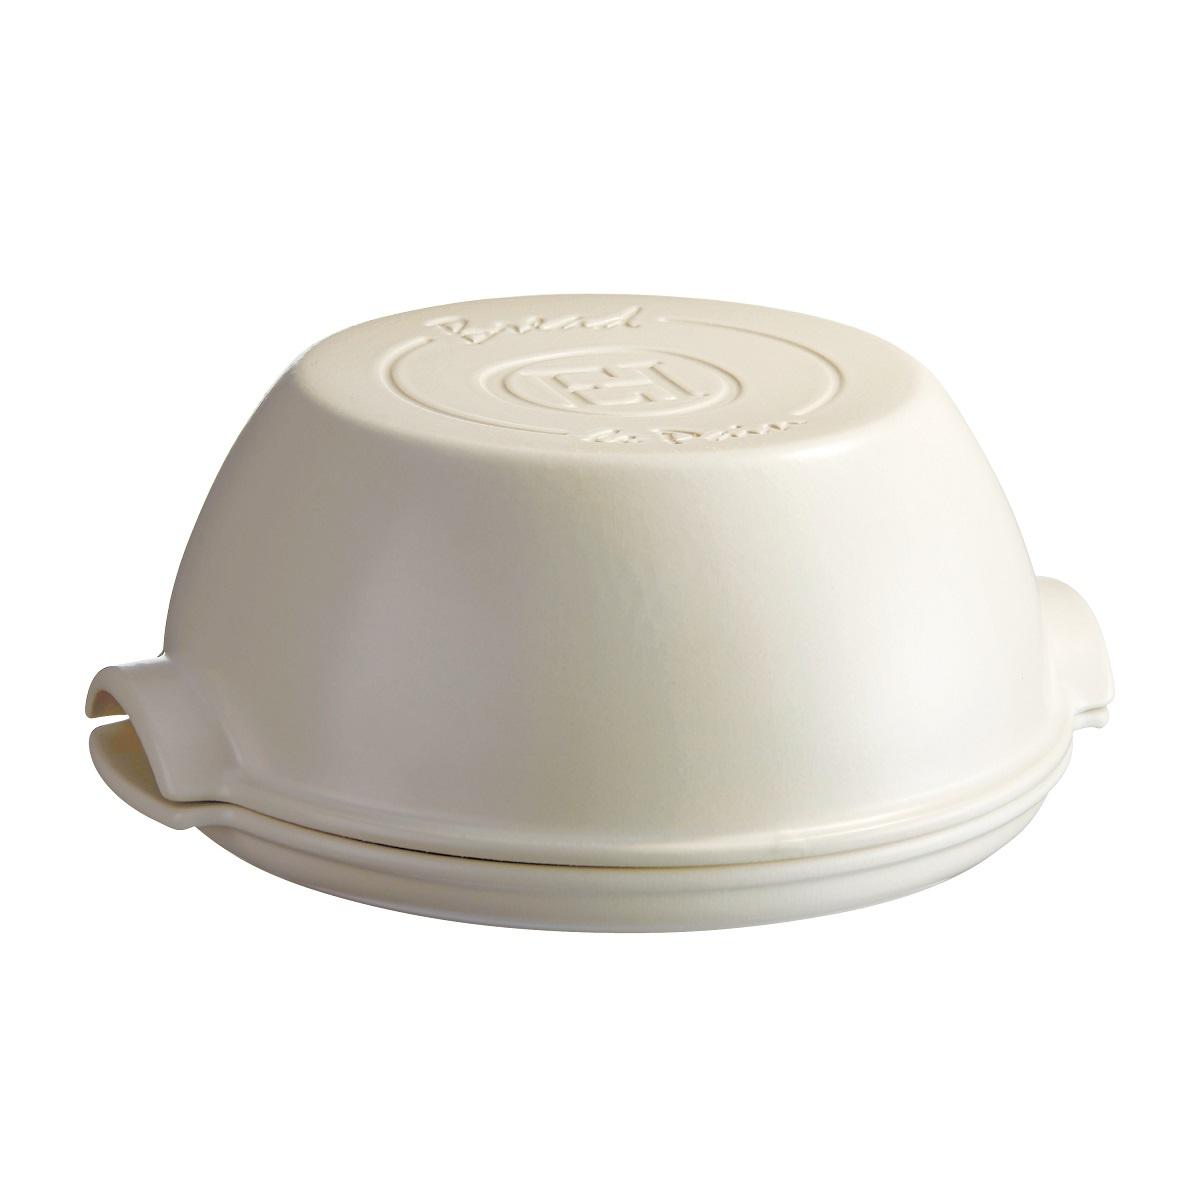 Онлайн каталог PROMENU: Форма для выпечки хлеба круглая с крышкой Emile Henry SPECIALIZED COOKING, керамика, 32,5x29,5x14 см, белый Emile Henry 505507